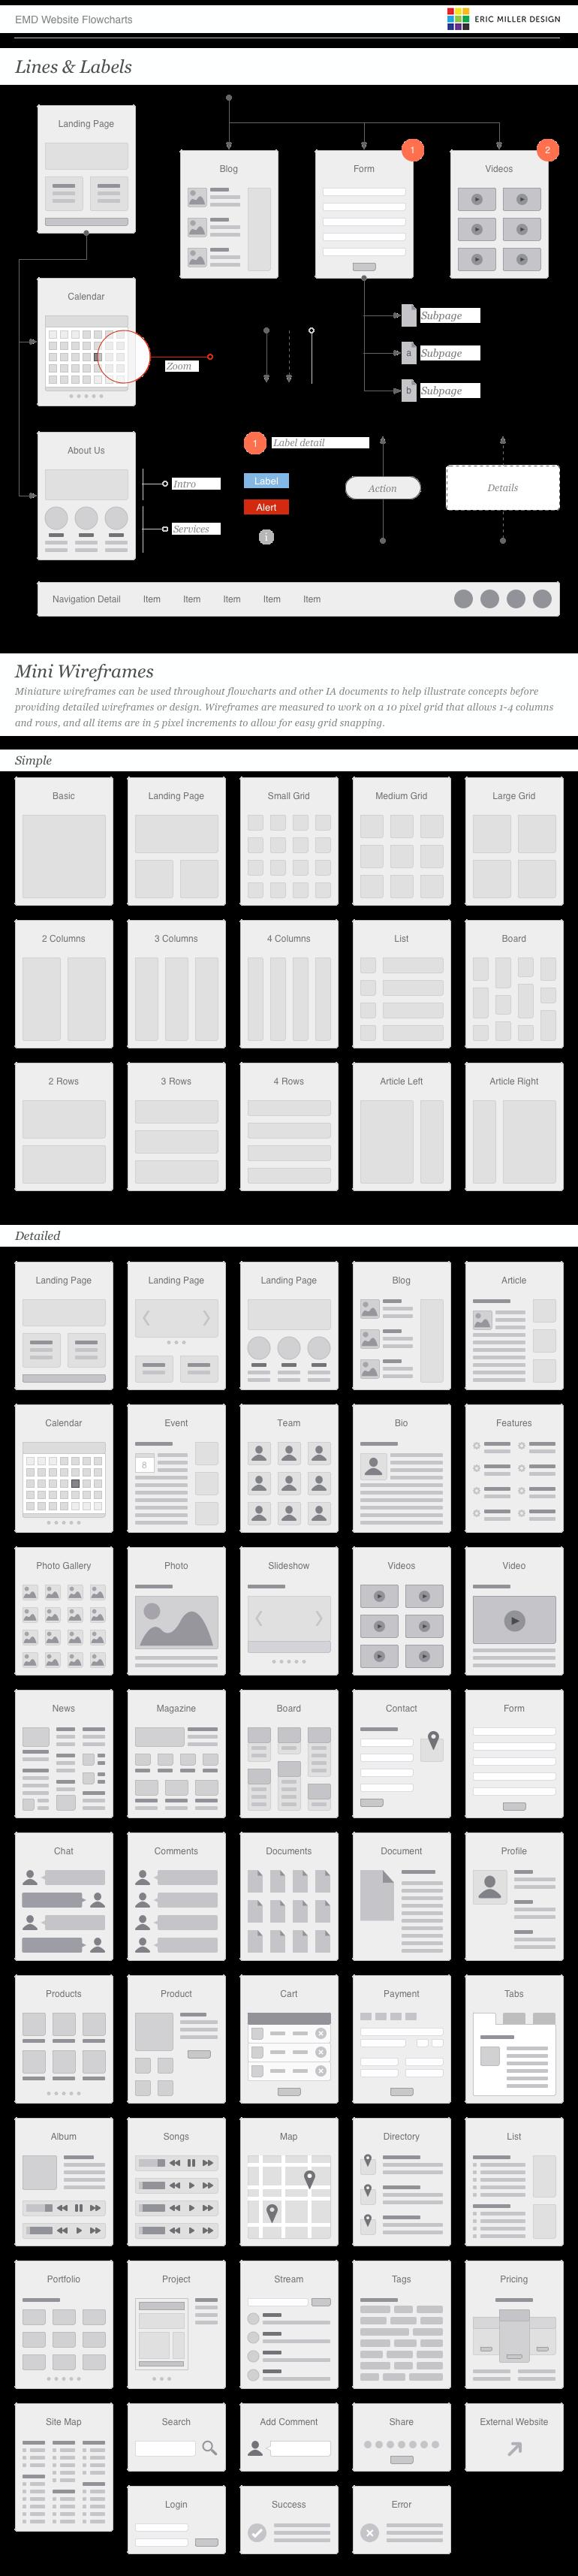 Website Flowcharts | Graffletopia